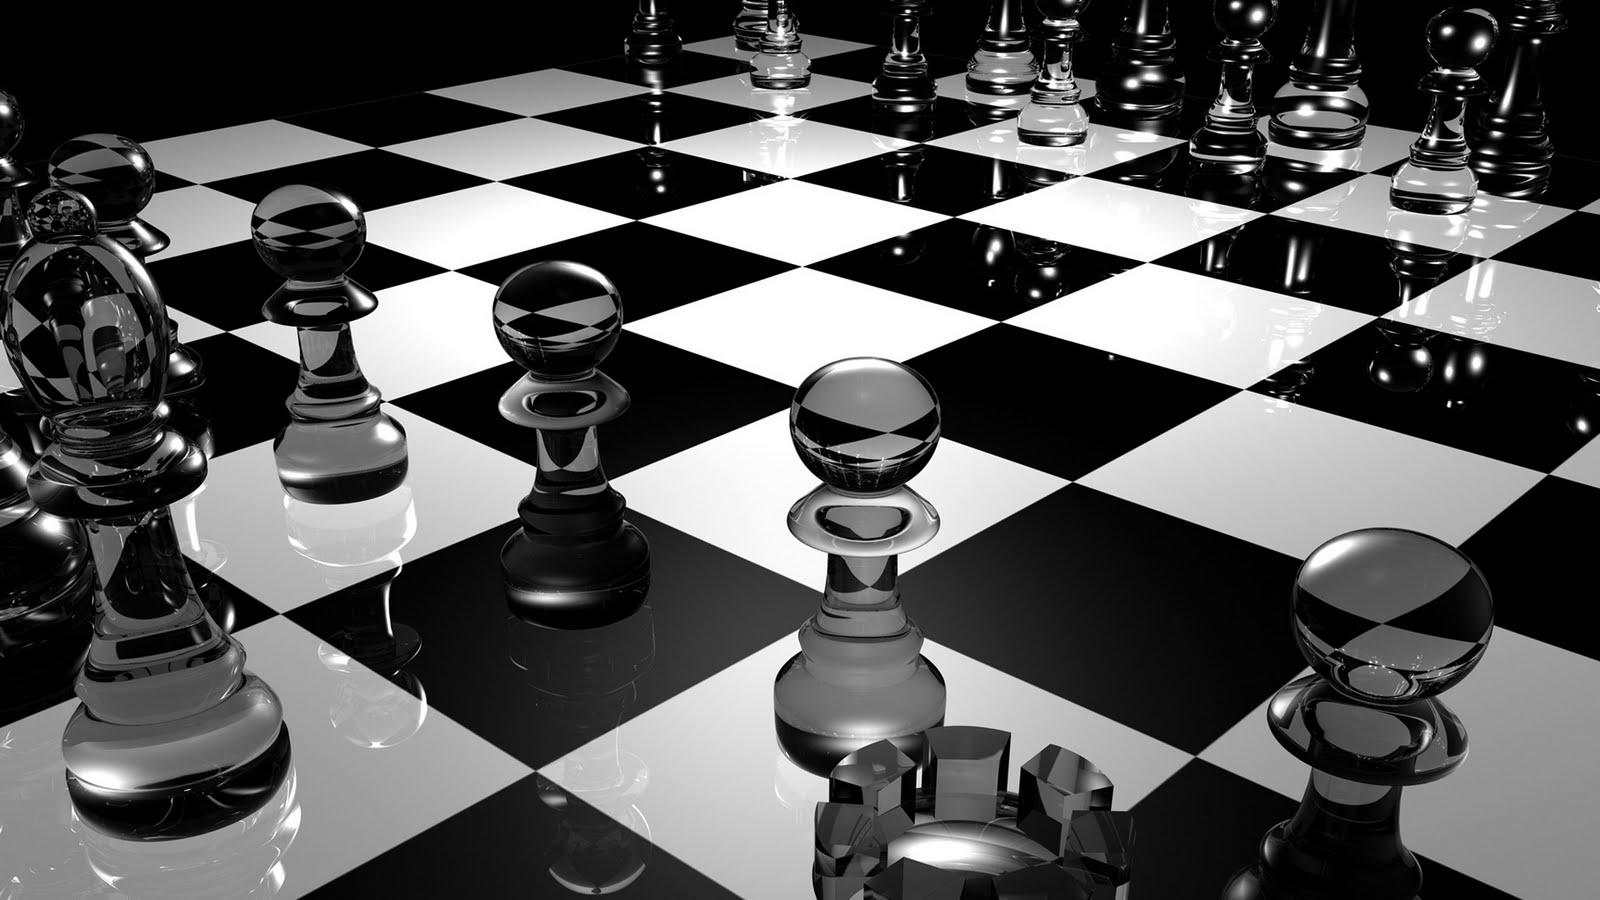 Chess Wallpaper Chess Game Hd Wallpapers: Kane Blog Picz: Tila Tequila Wallpaper 1920x1080